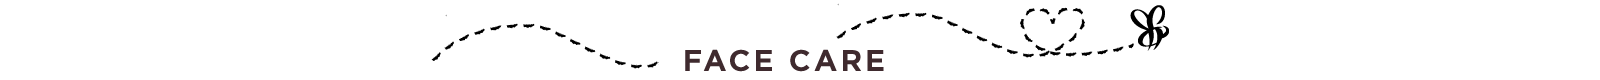 Melvita Face Care Title